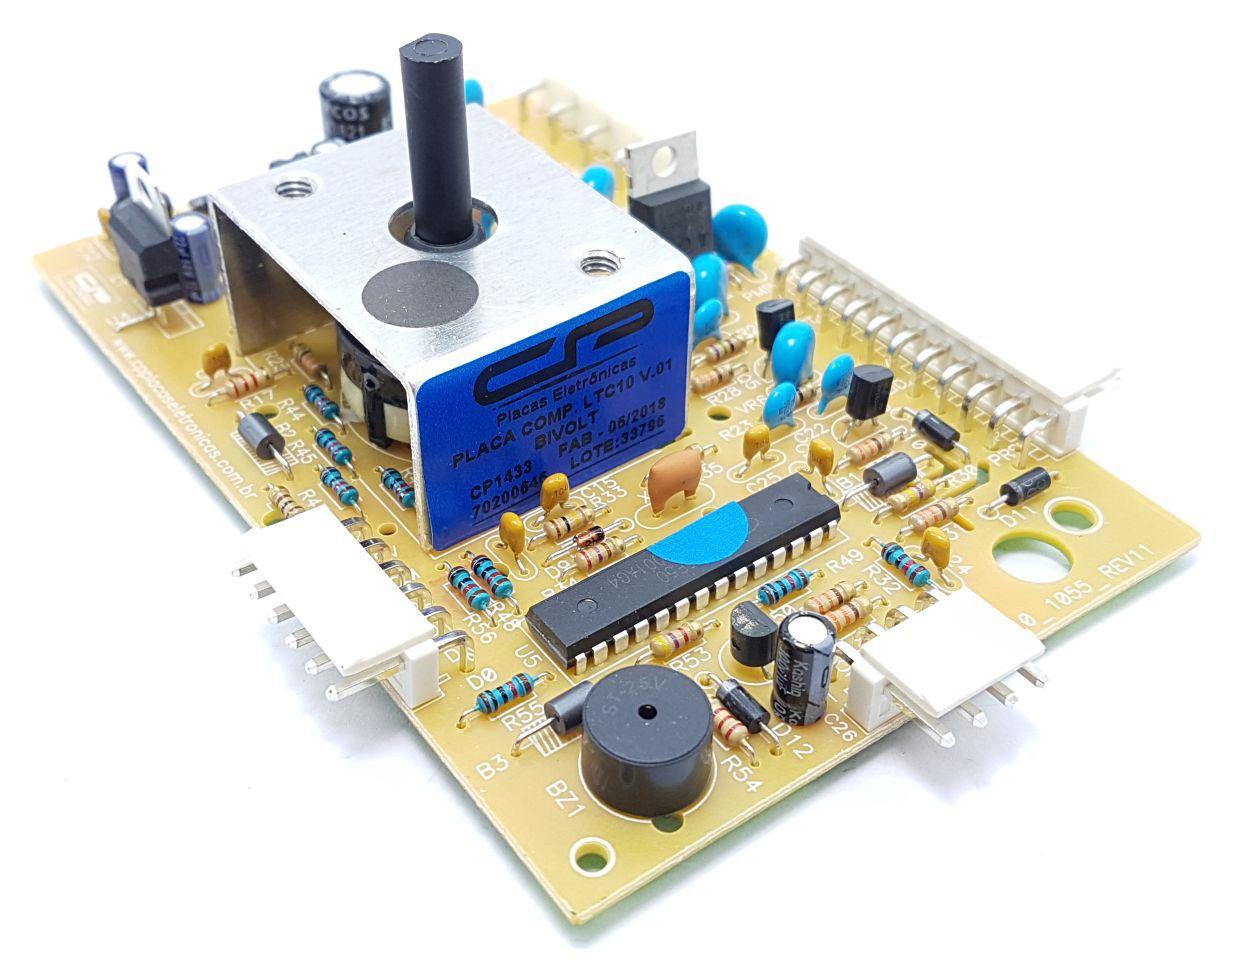 Placa Eletrônica Electrolux Compatível Ltc10aw 70200646 Bivolt Cp1433